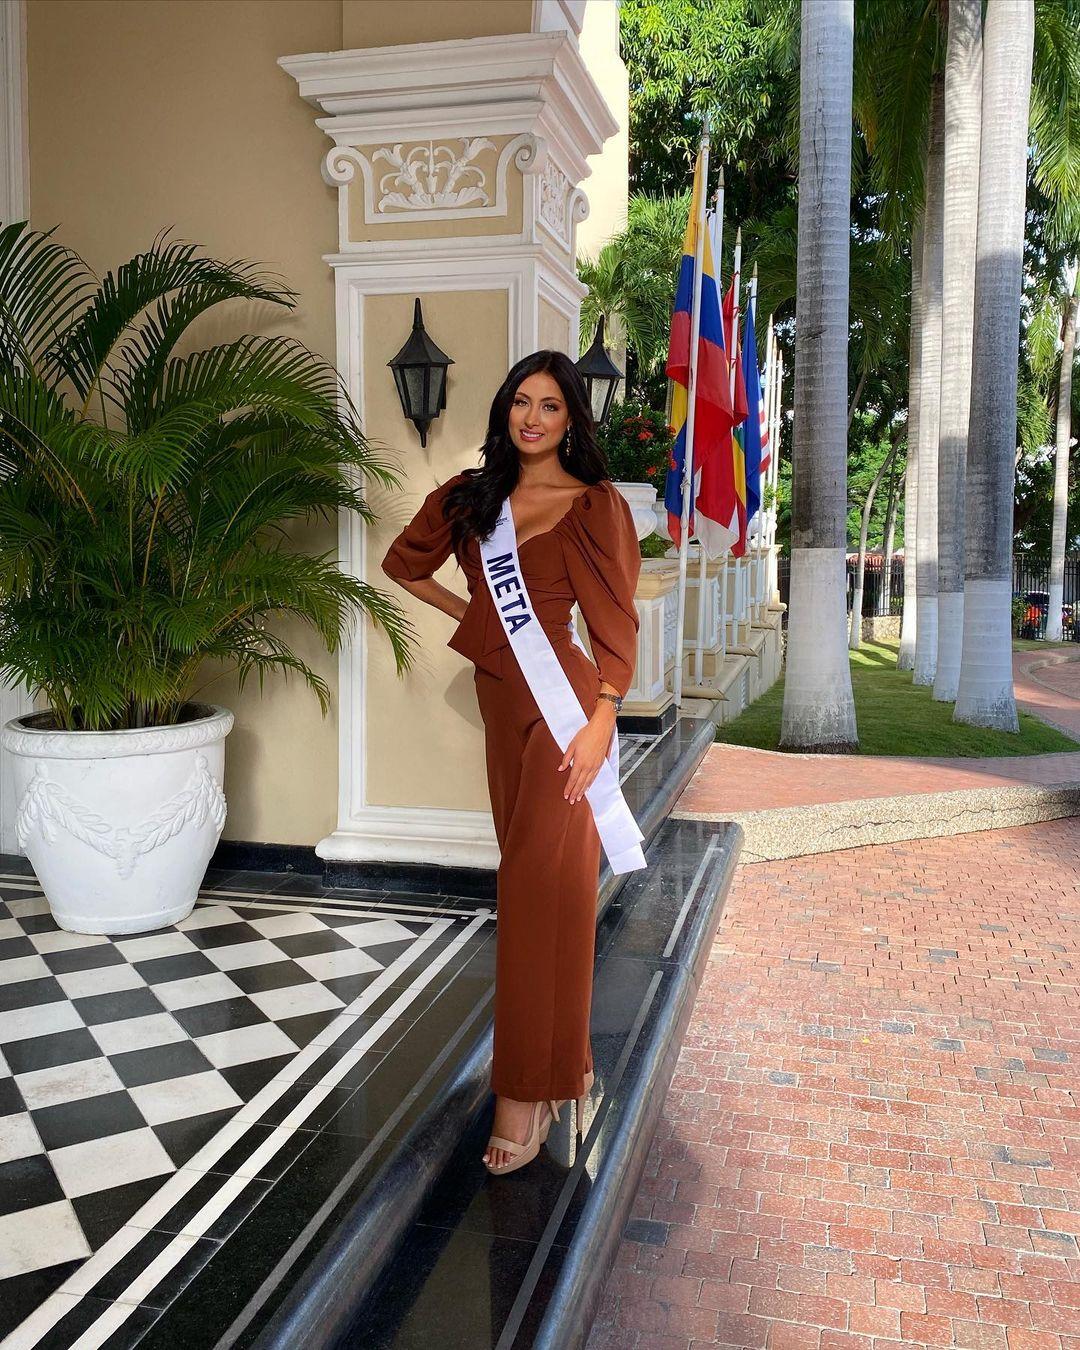 juliana franco, top 16 de miss colombia universo 2020/miss earth water 2017. - Página 21 Julifr25